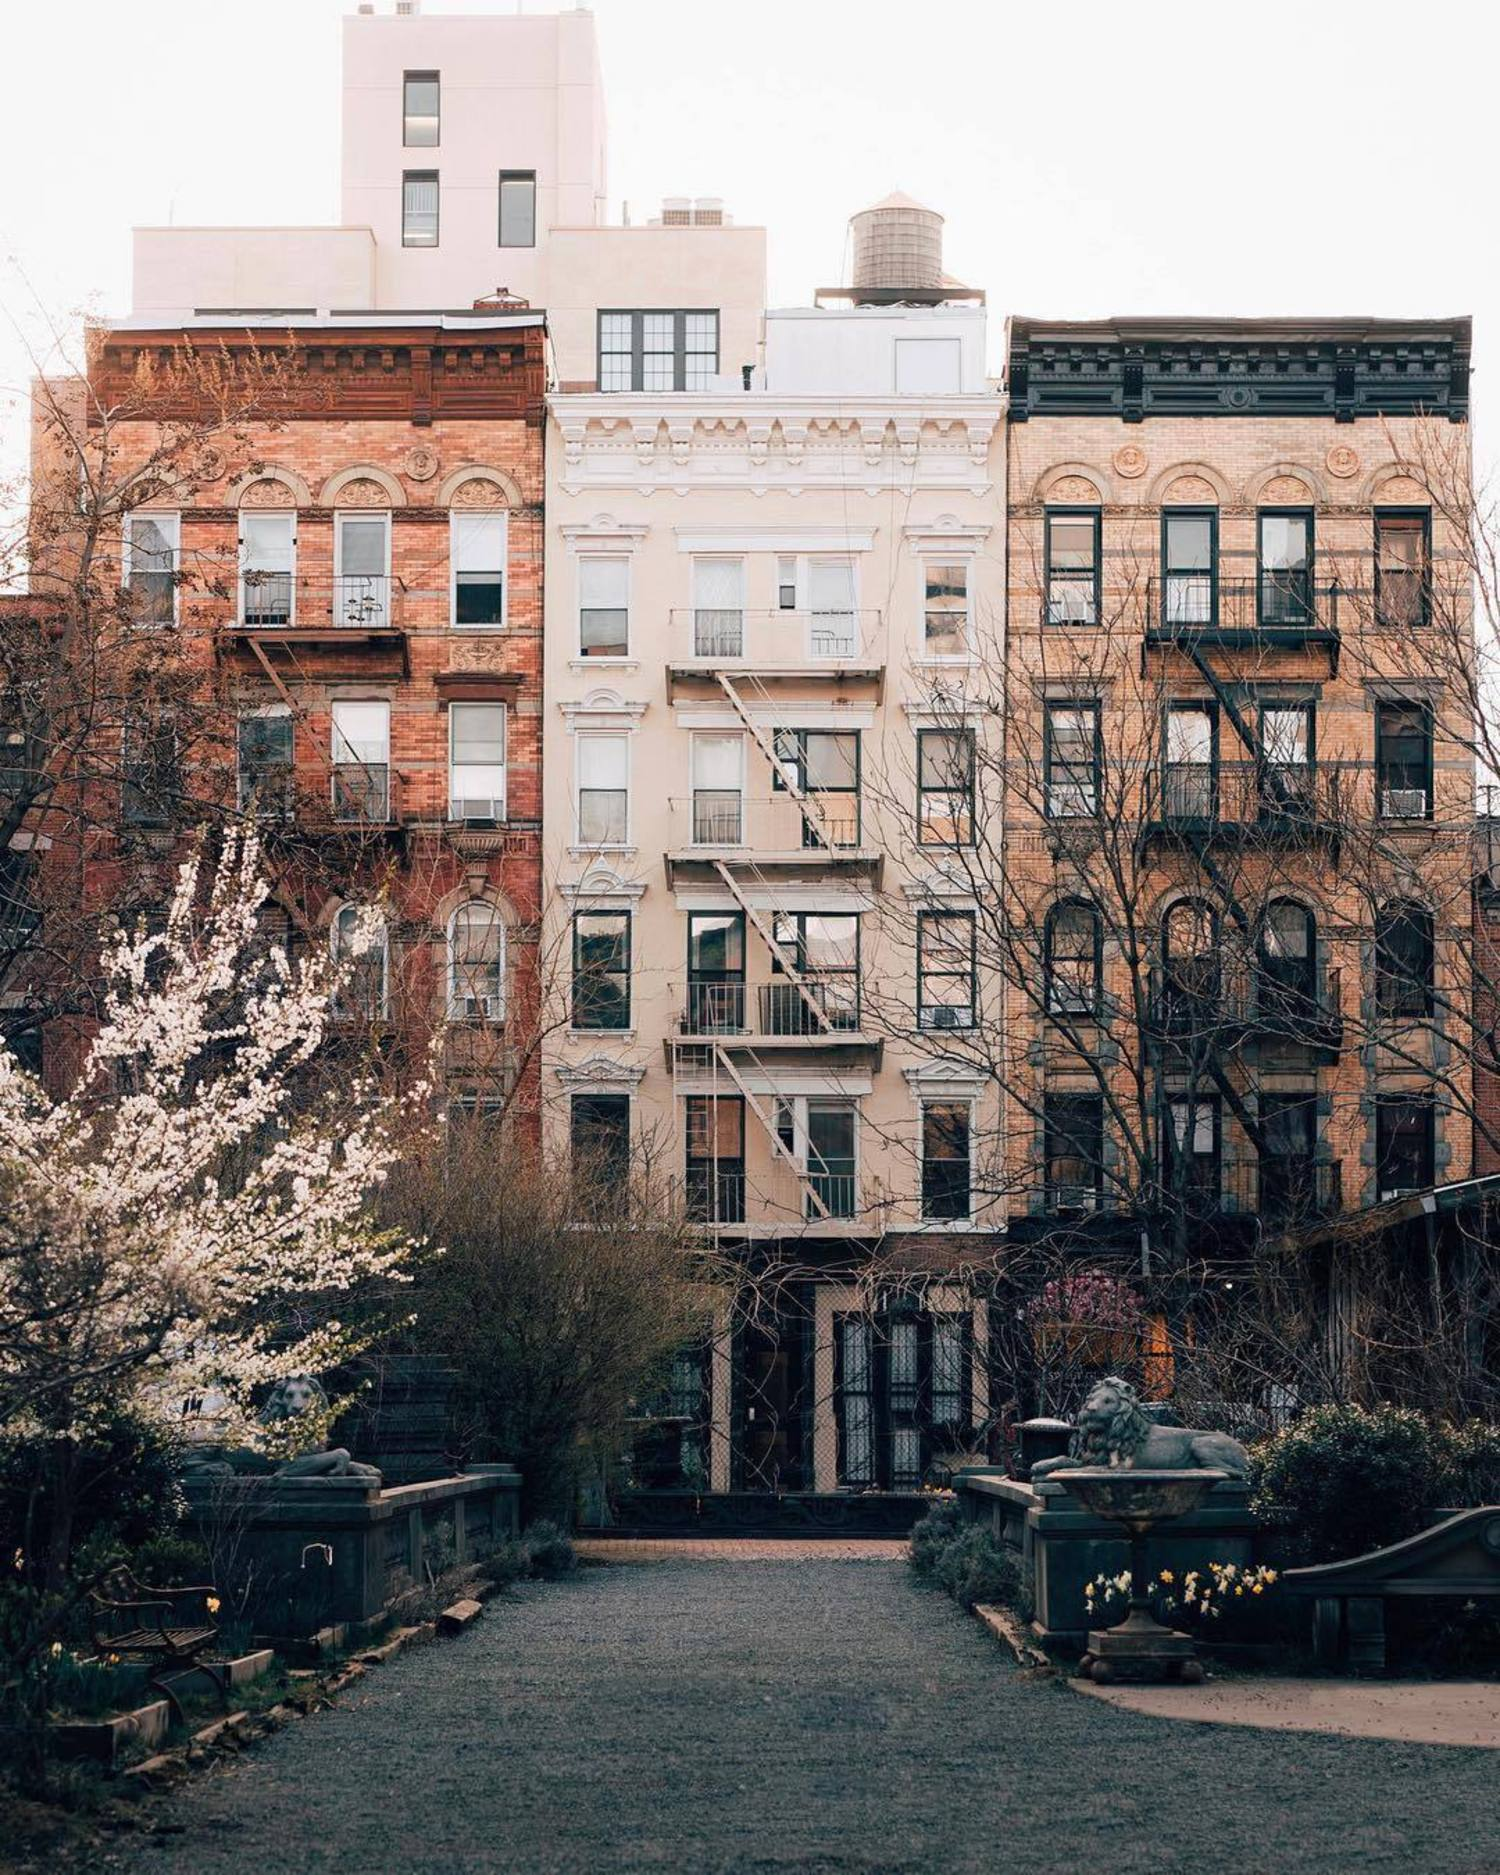 Elizabeth Street Garden, SoHo, Manhattan. Photo via @joethommas #viewingnyc #nyc #newyork #newyorkcity #elizabethstreetgarden